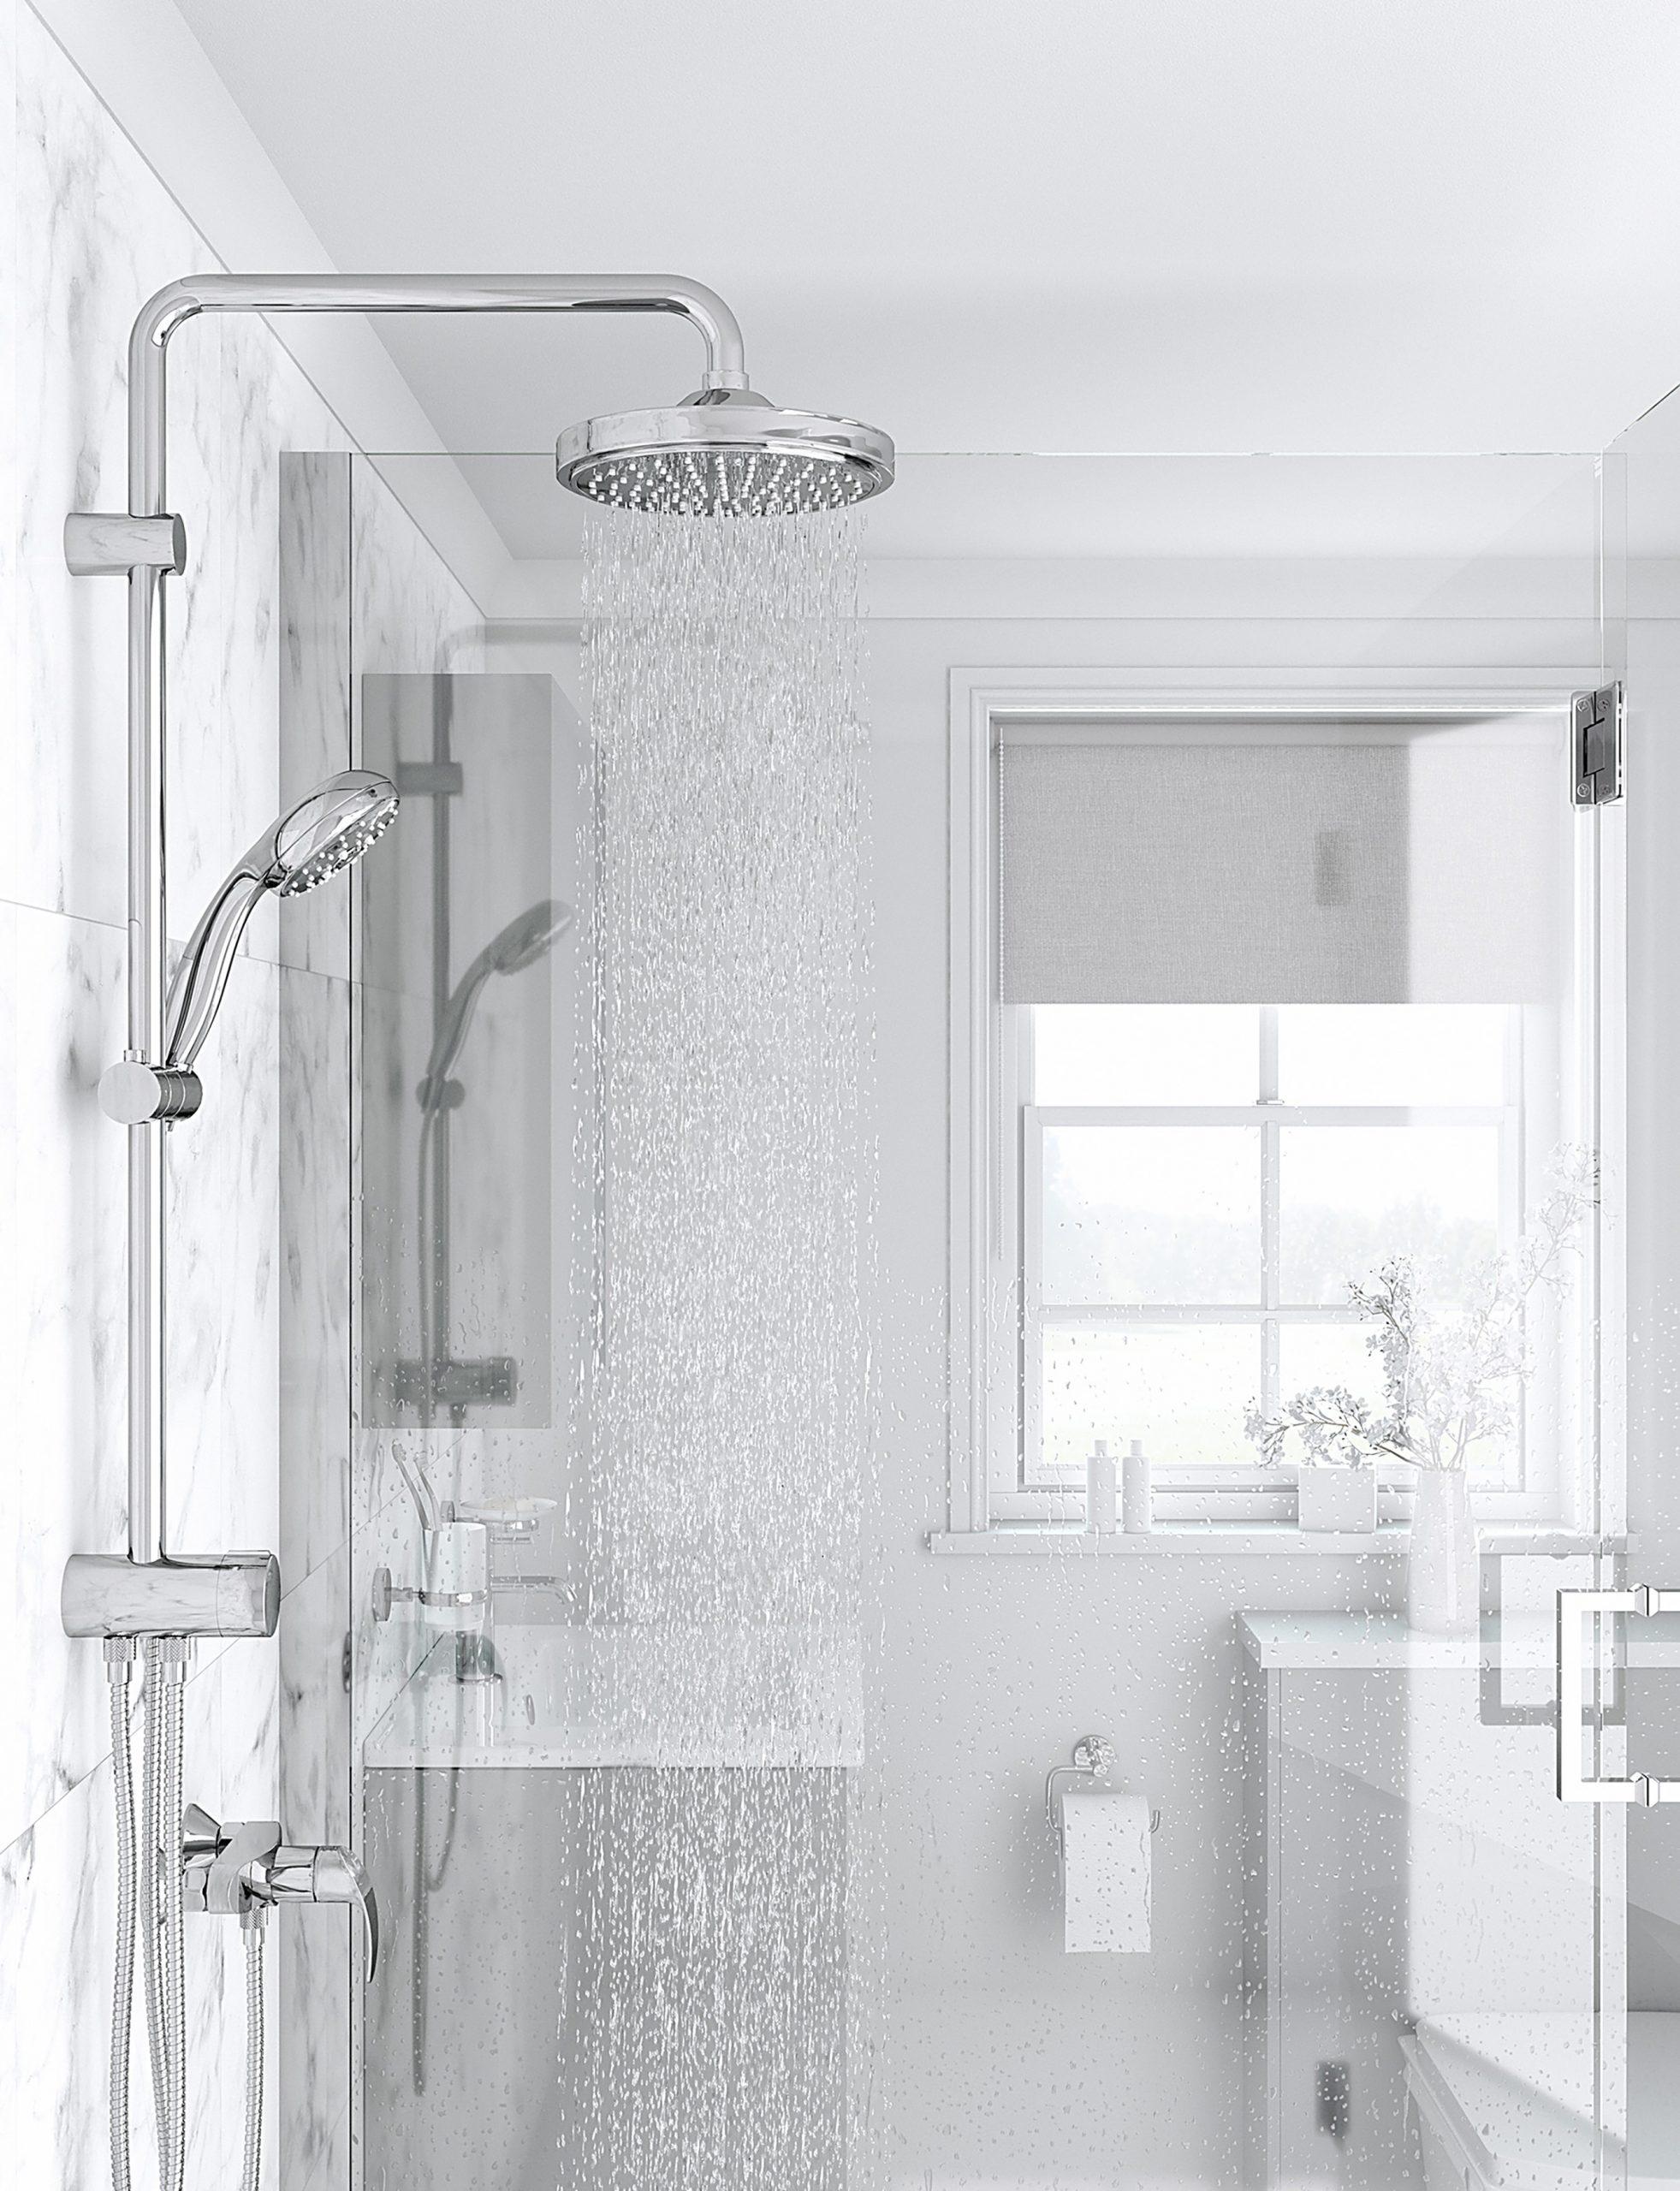 High key, CGI image of shower.